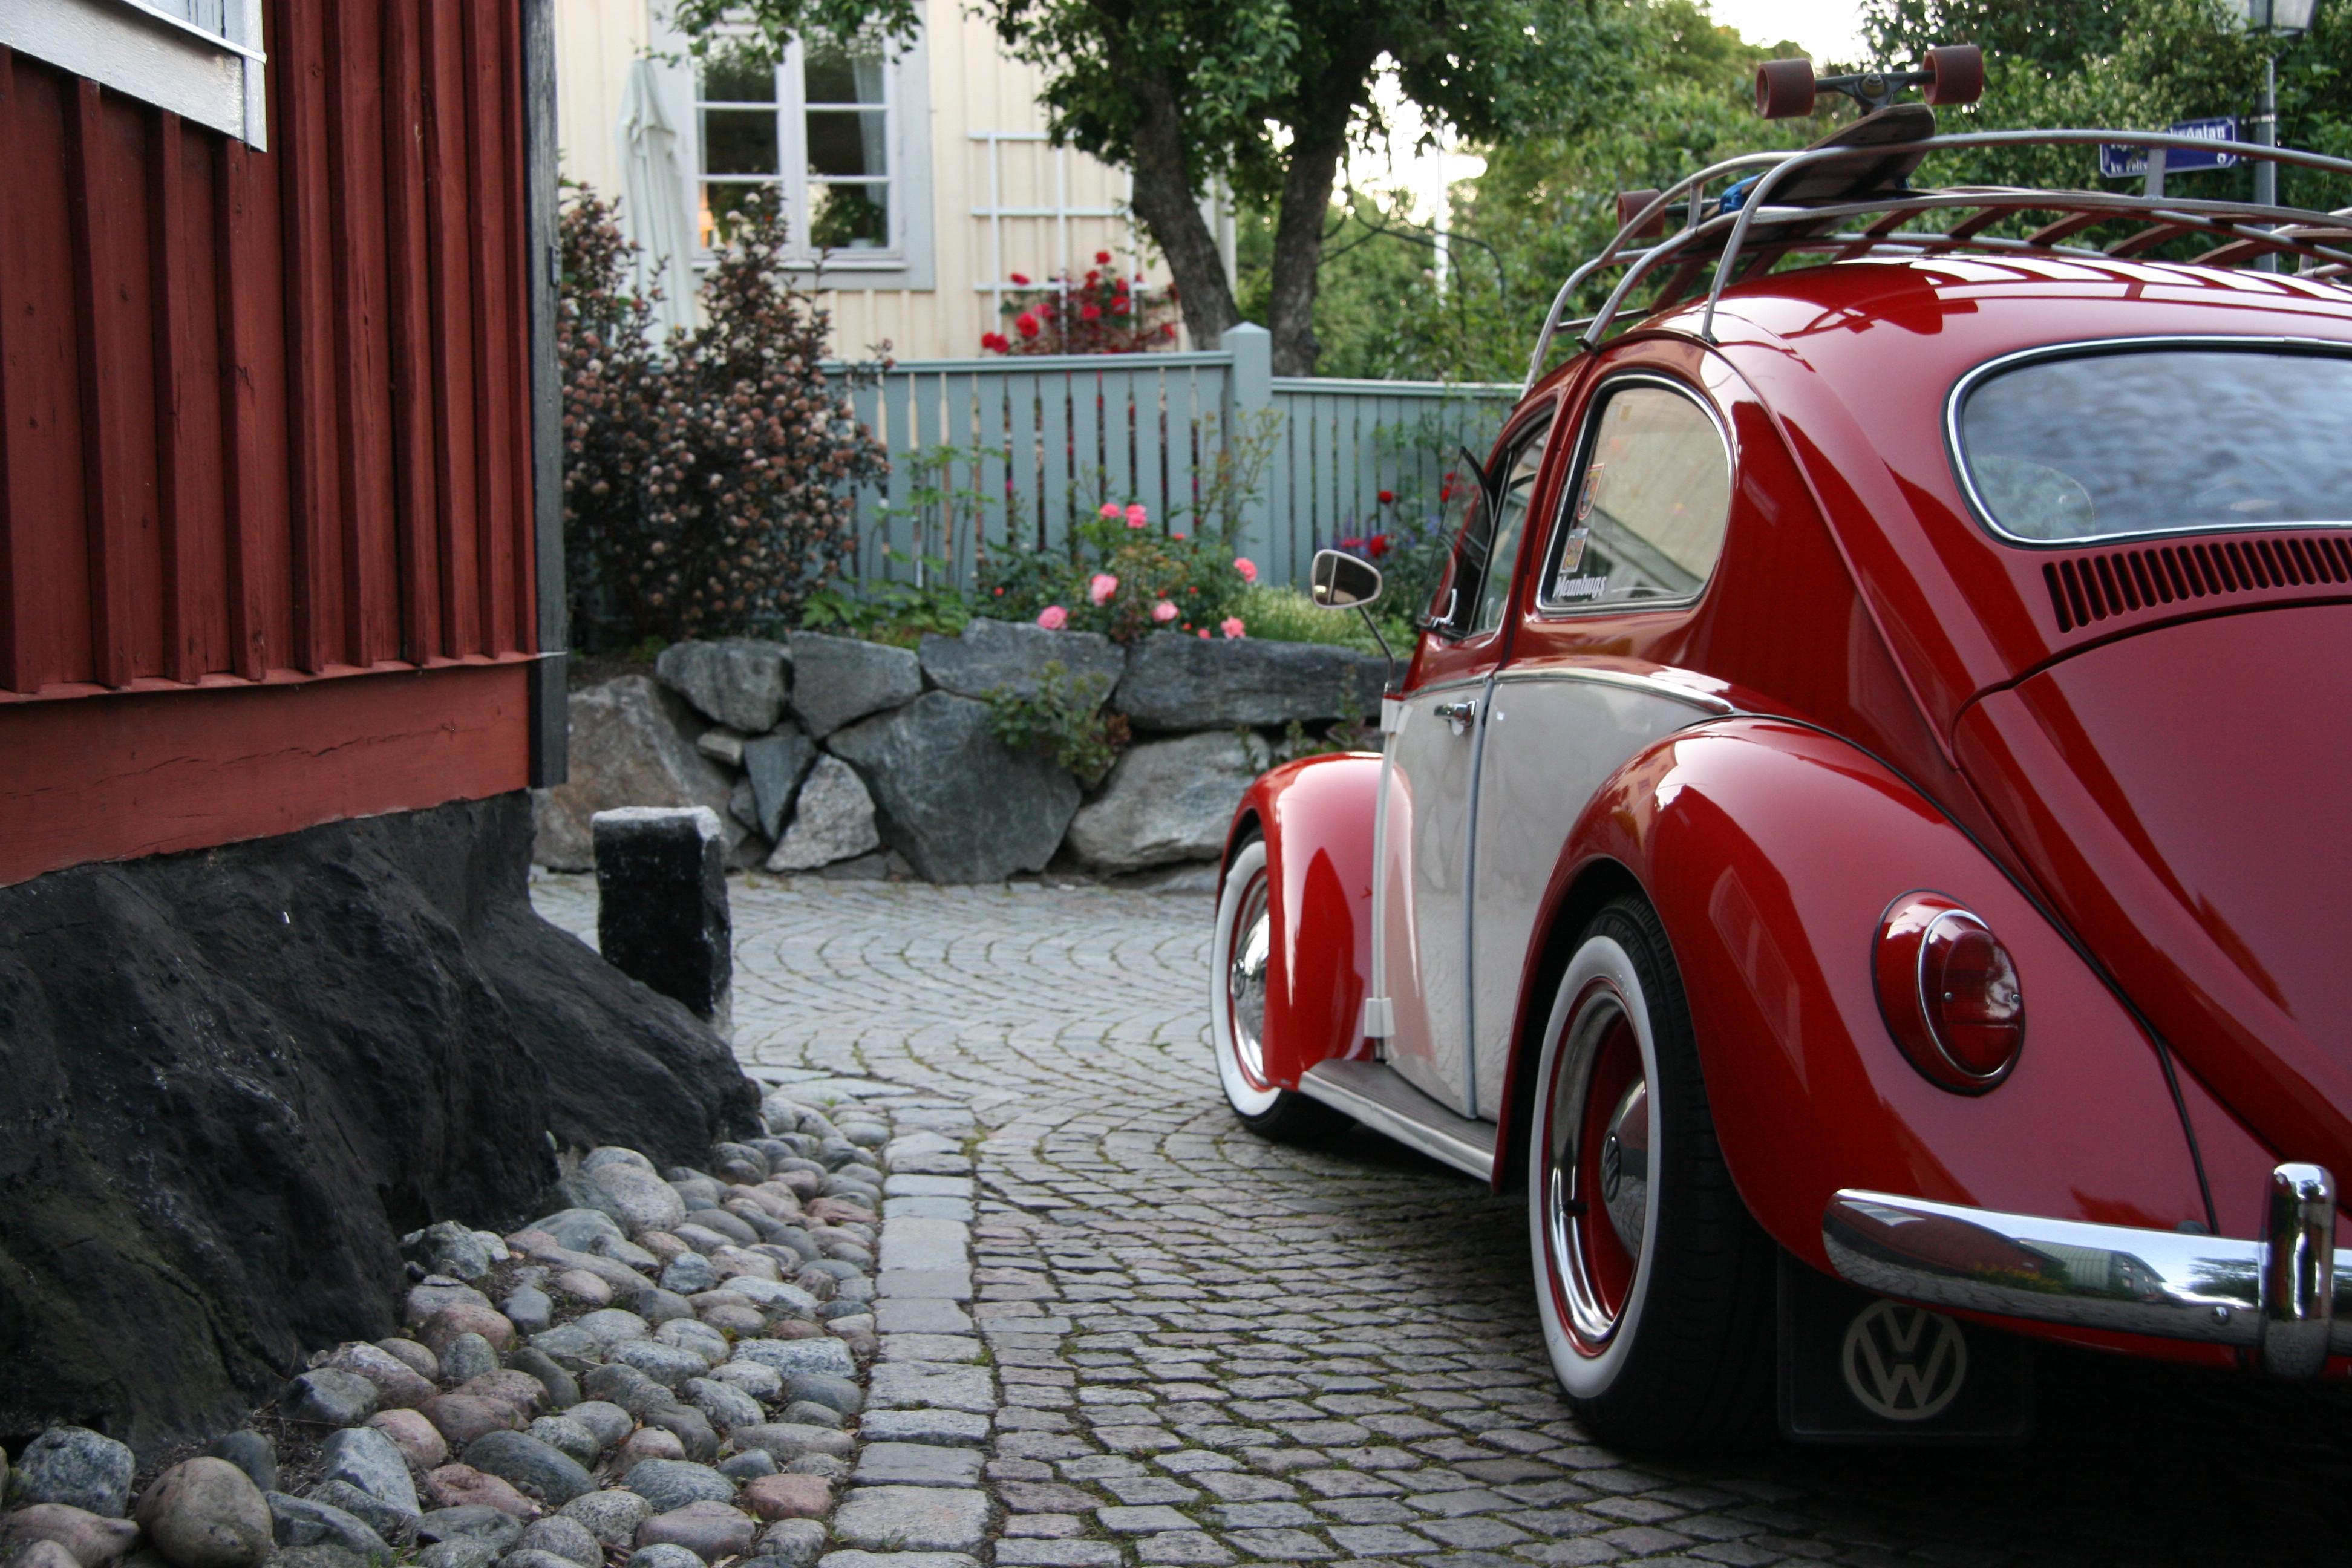 http://mr-nicke.se/stuff/projekt.boxerville/nya%20falgar2012/IMG_6958.JPG